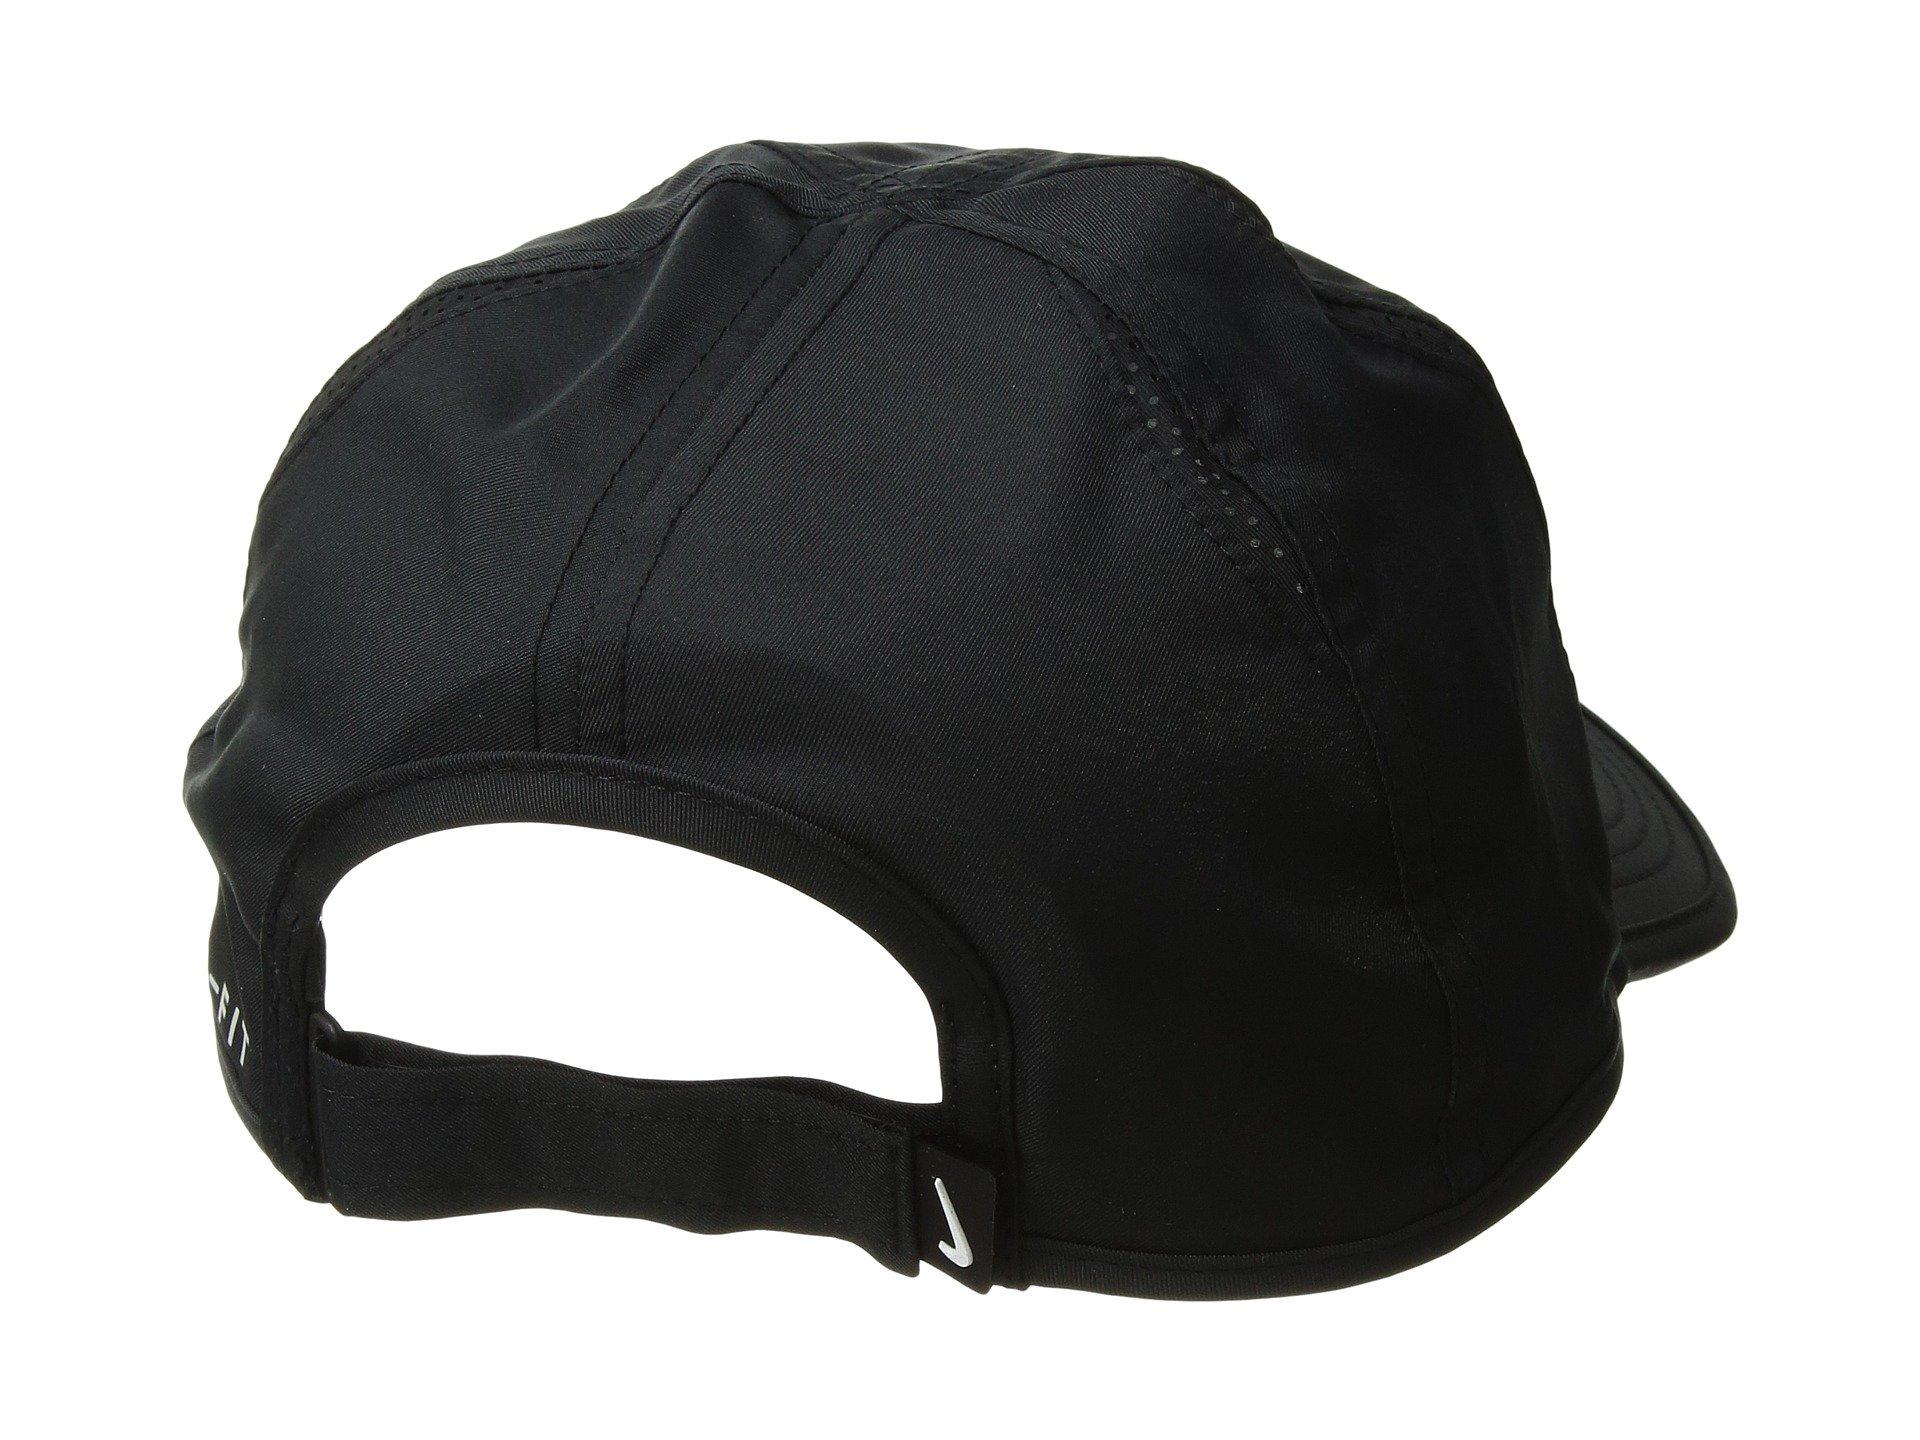 Nike Unisex Court AeroBill Featherlight Tennis Adjustable Cap Black/Black/Orange Peel (ONE Size) by NIKE (Image #3)